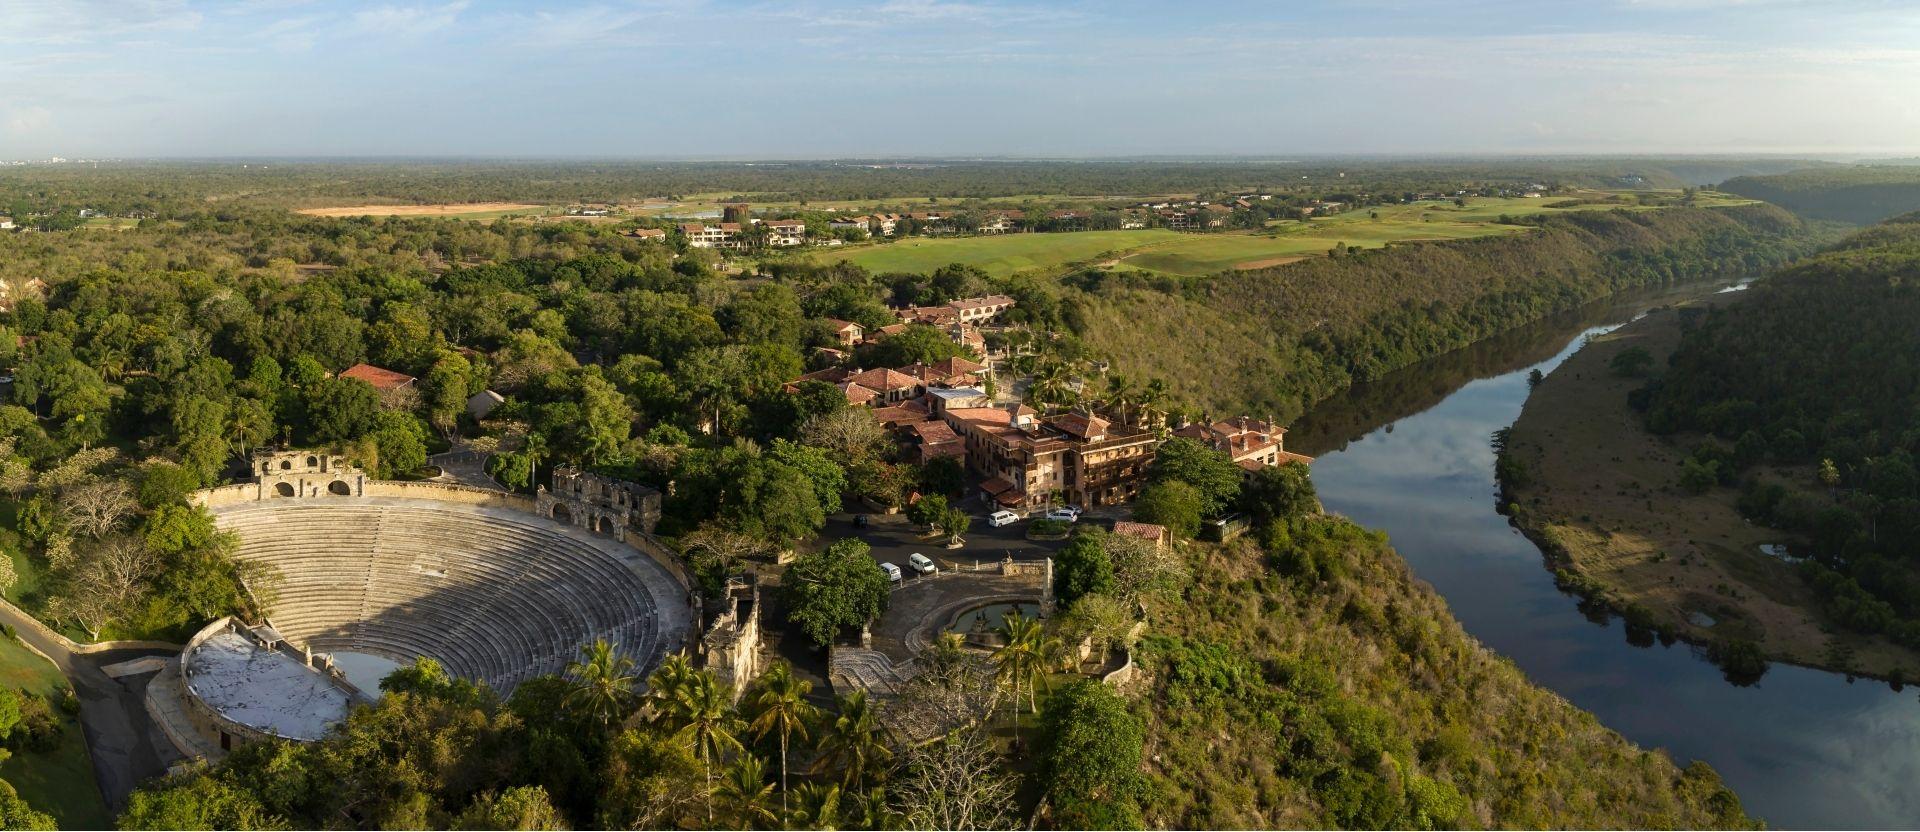 An aerial view of the Altos de Chavon village and amphitheatre